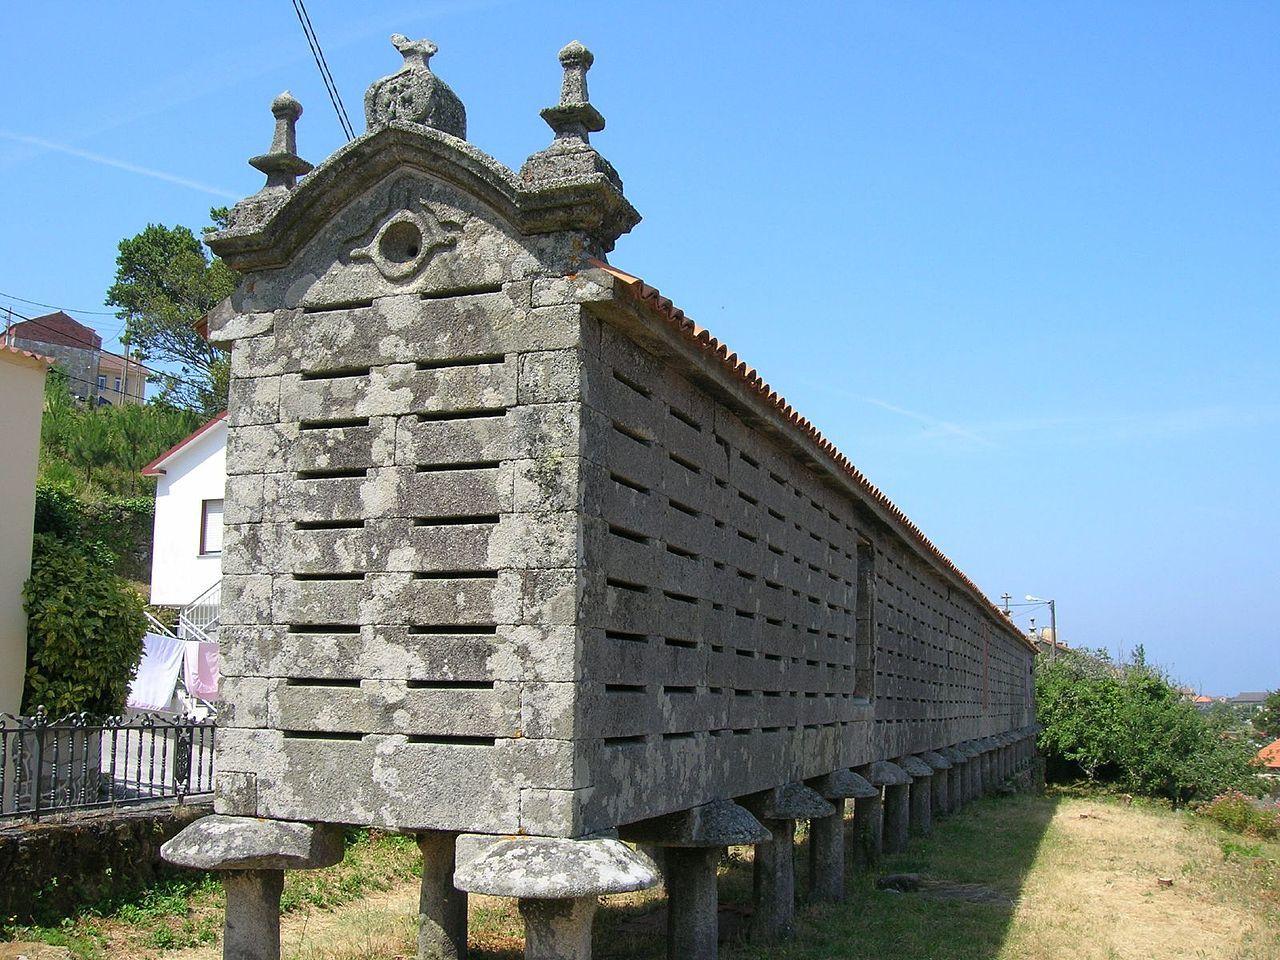 Galician Granary Leaning Tower Of Pisa Galicia Adventure Travel